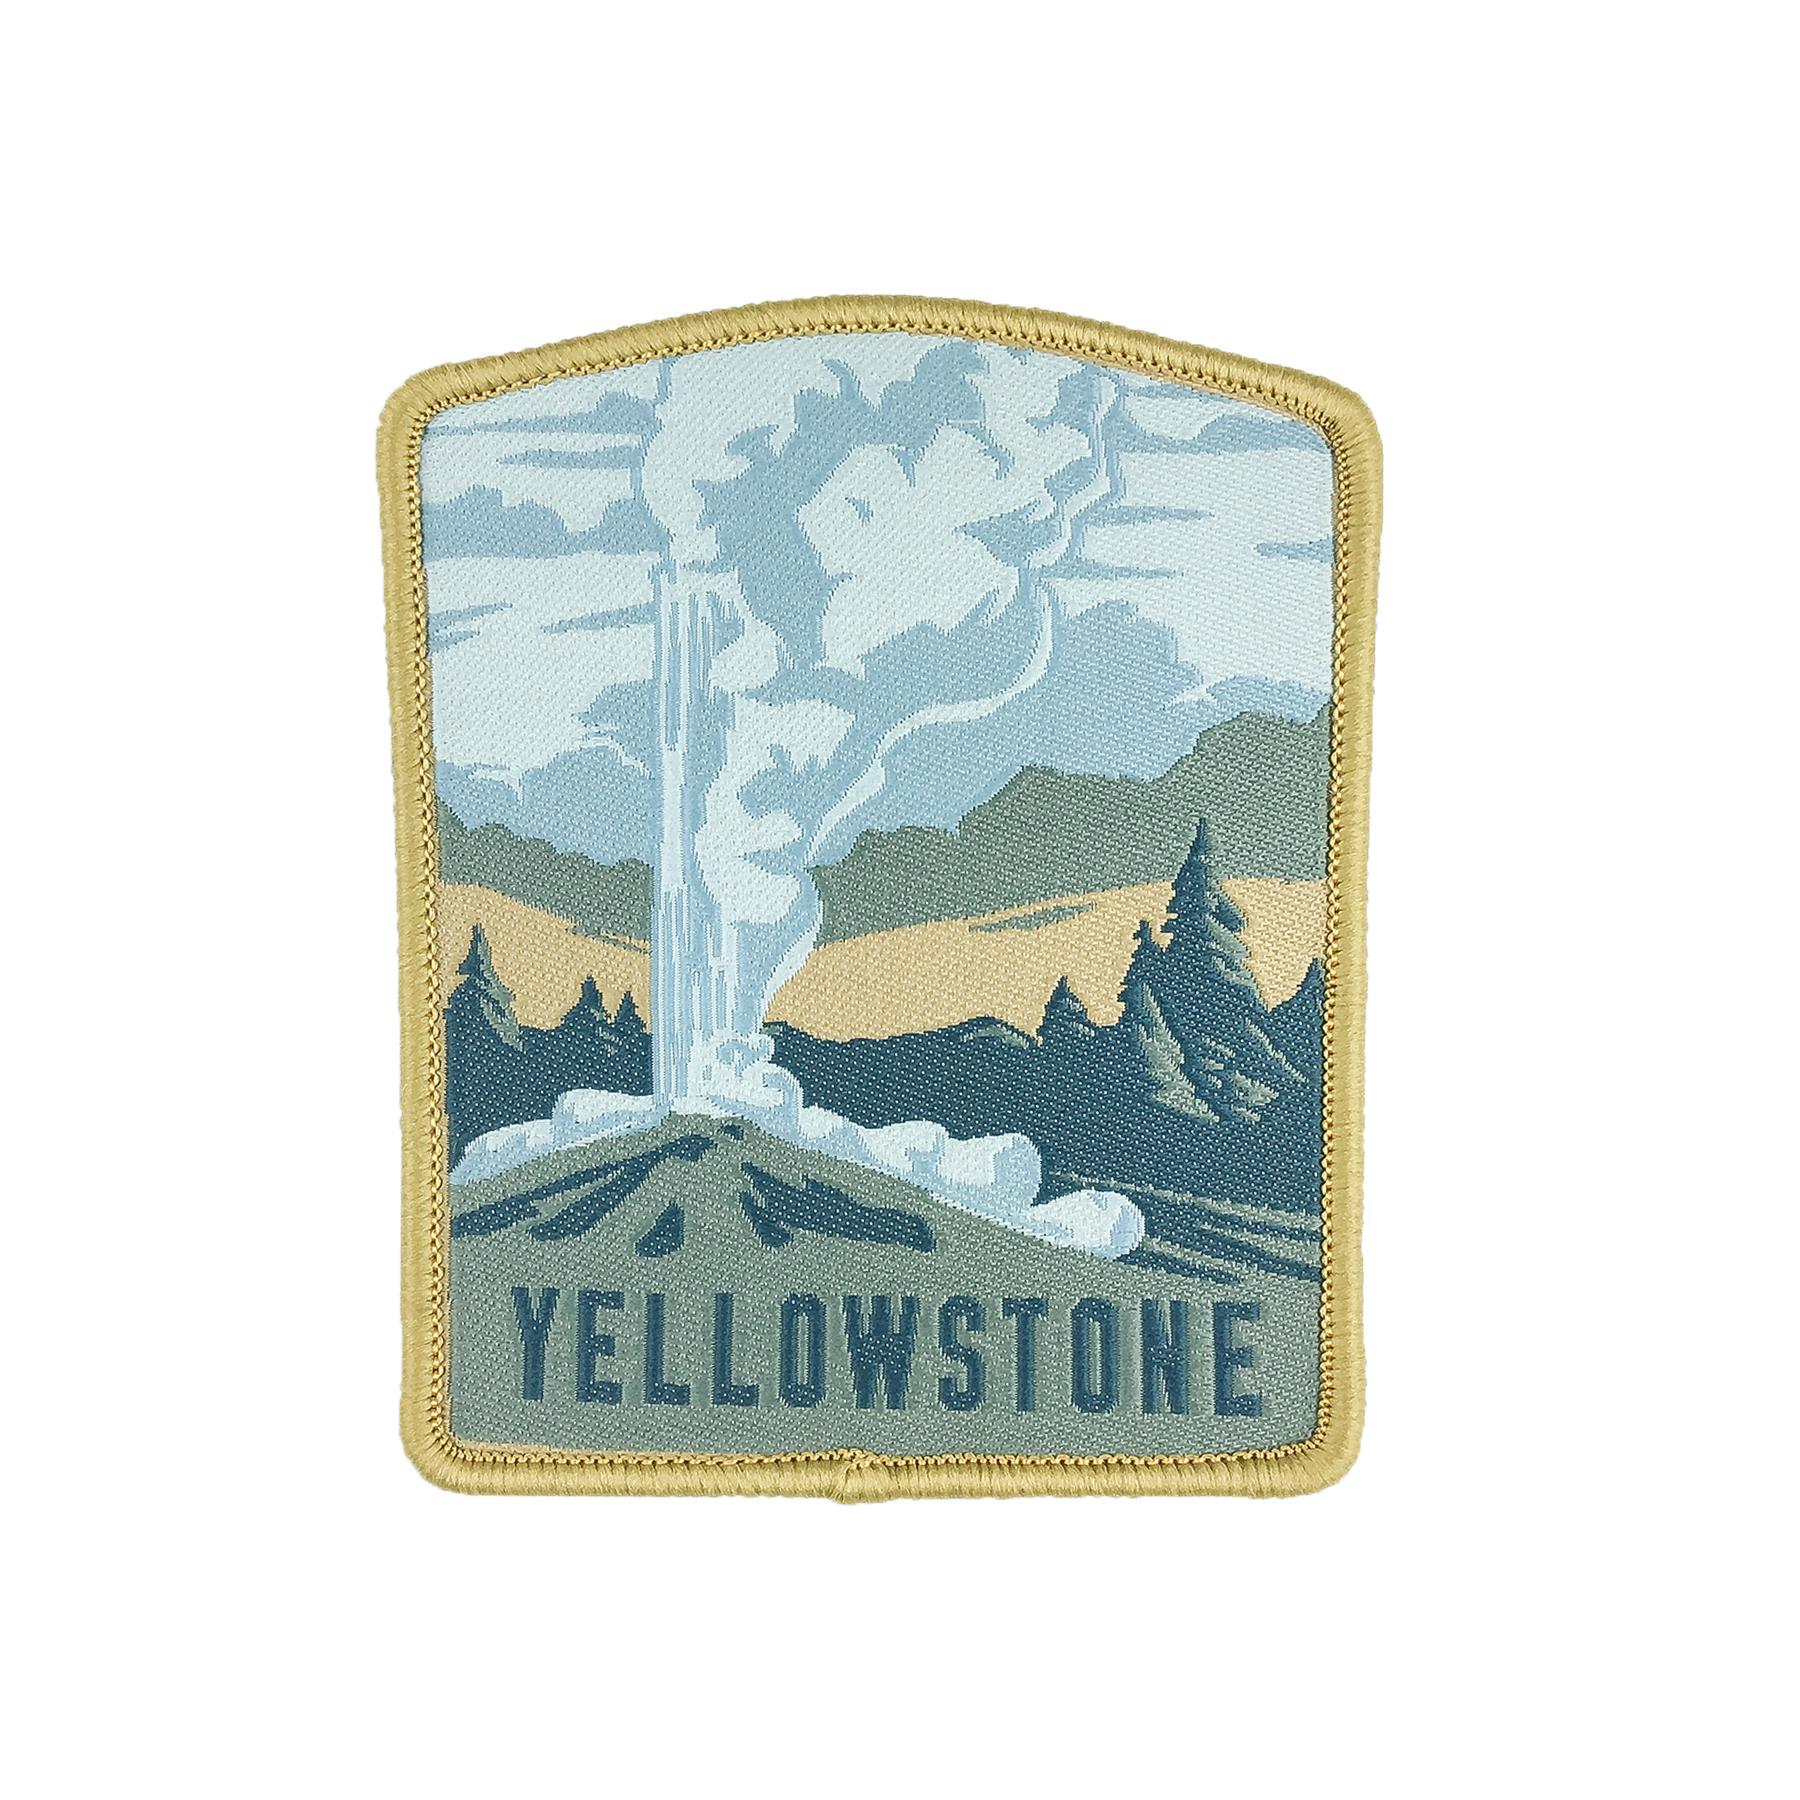 yellowstone-patch.jpg